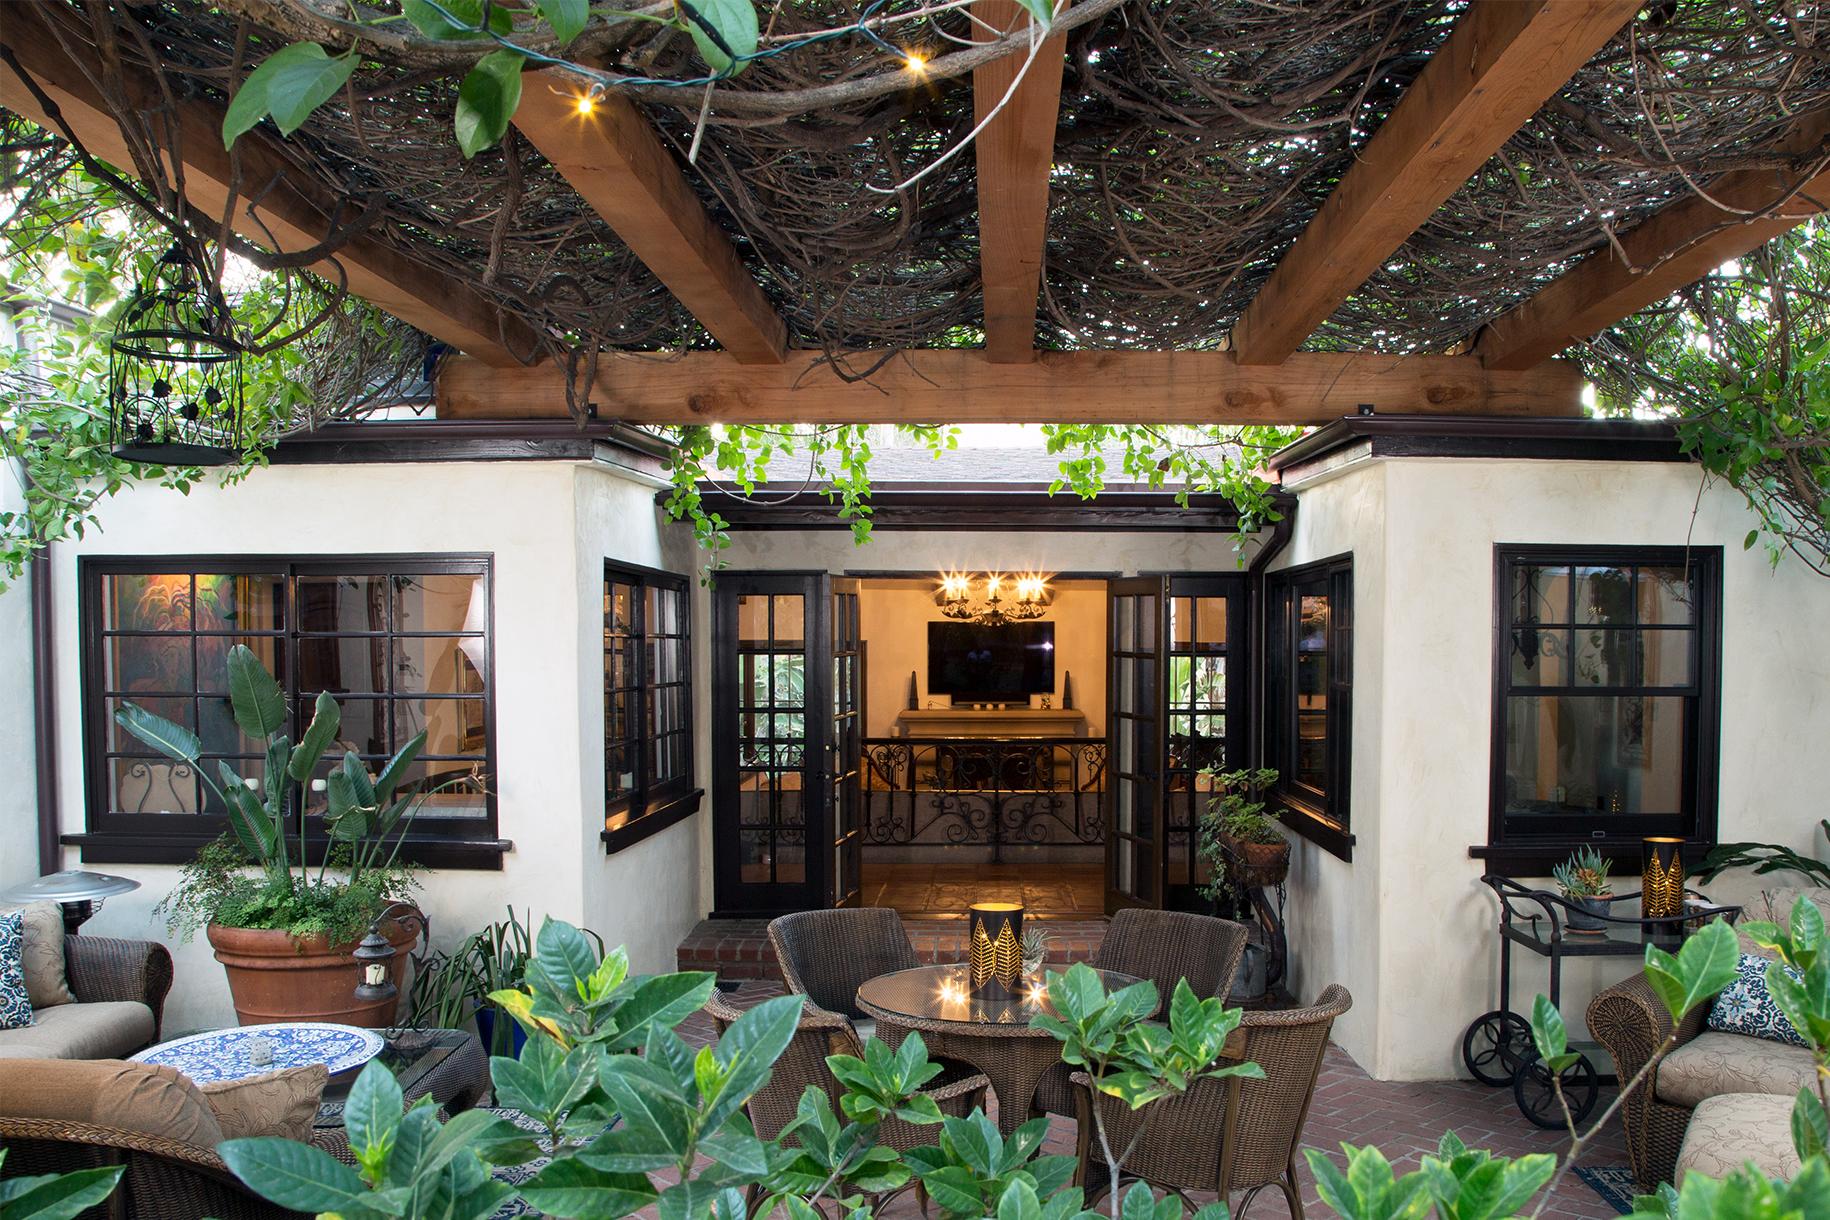 Expansive Redwood Timber Pergola Creates Verdant Courtyard